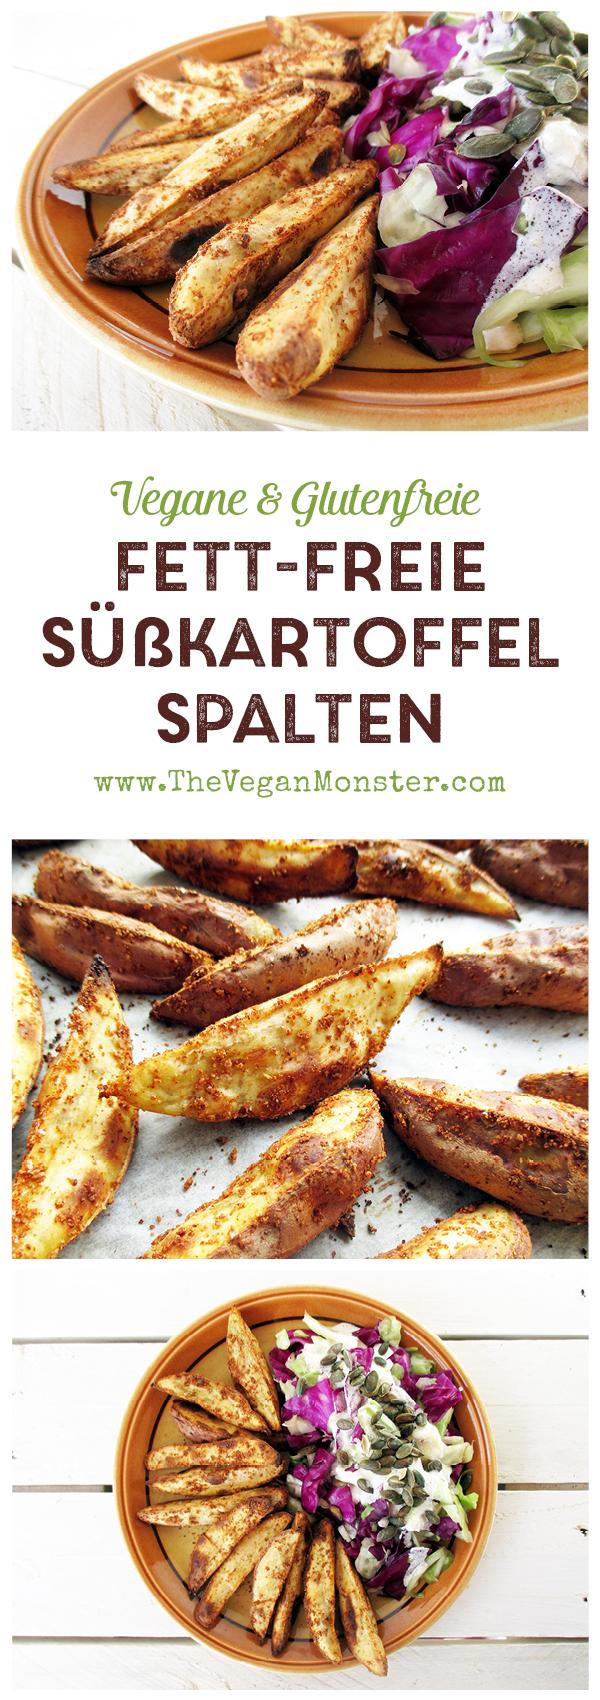 Vegan Gluten-free Oil-free Crispy Sweet Potato Kumara Wedges